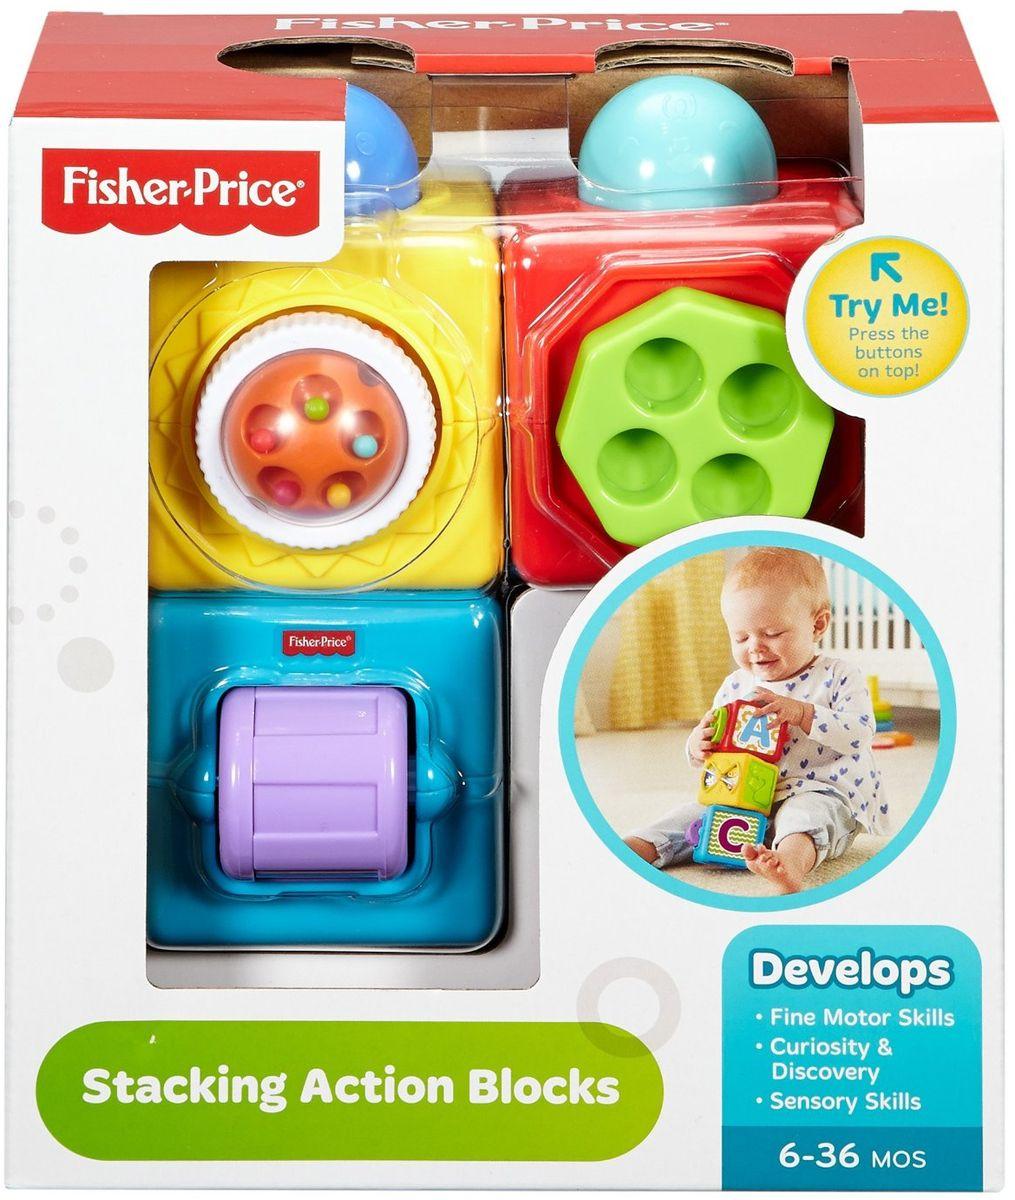 Fisher-PriceРазвивающие кубики Mattel